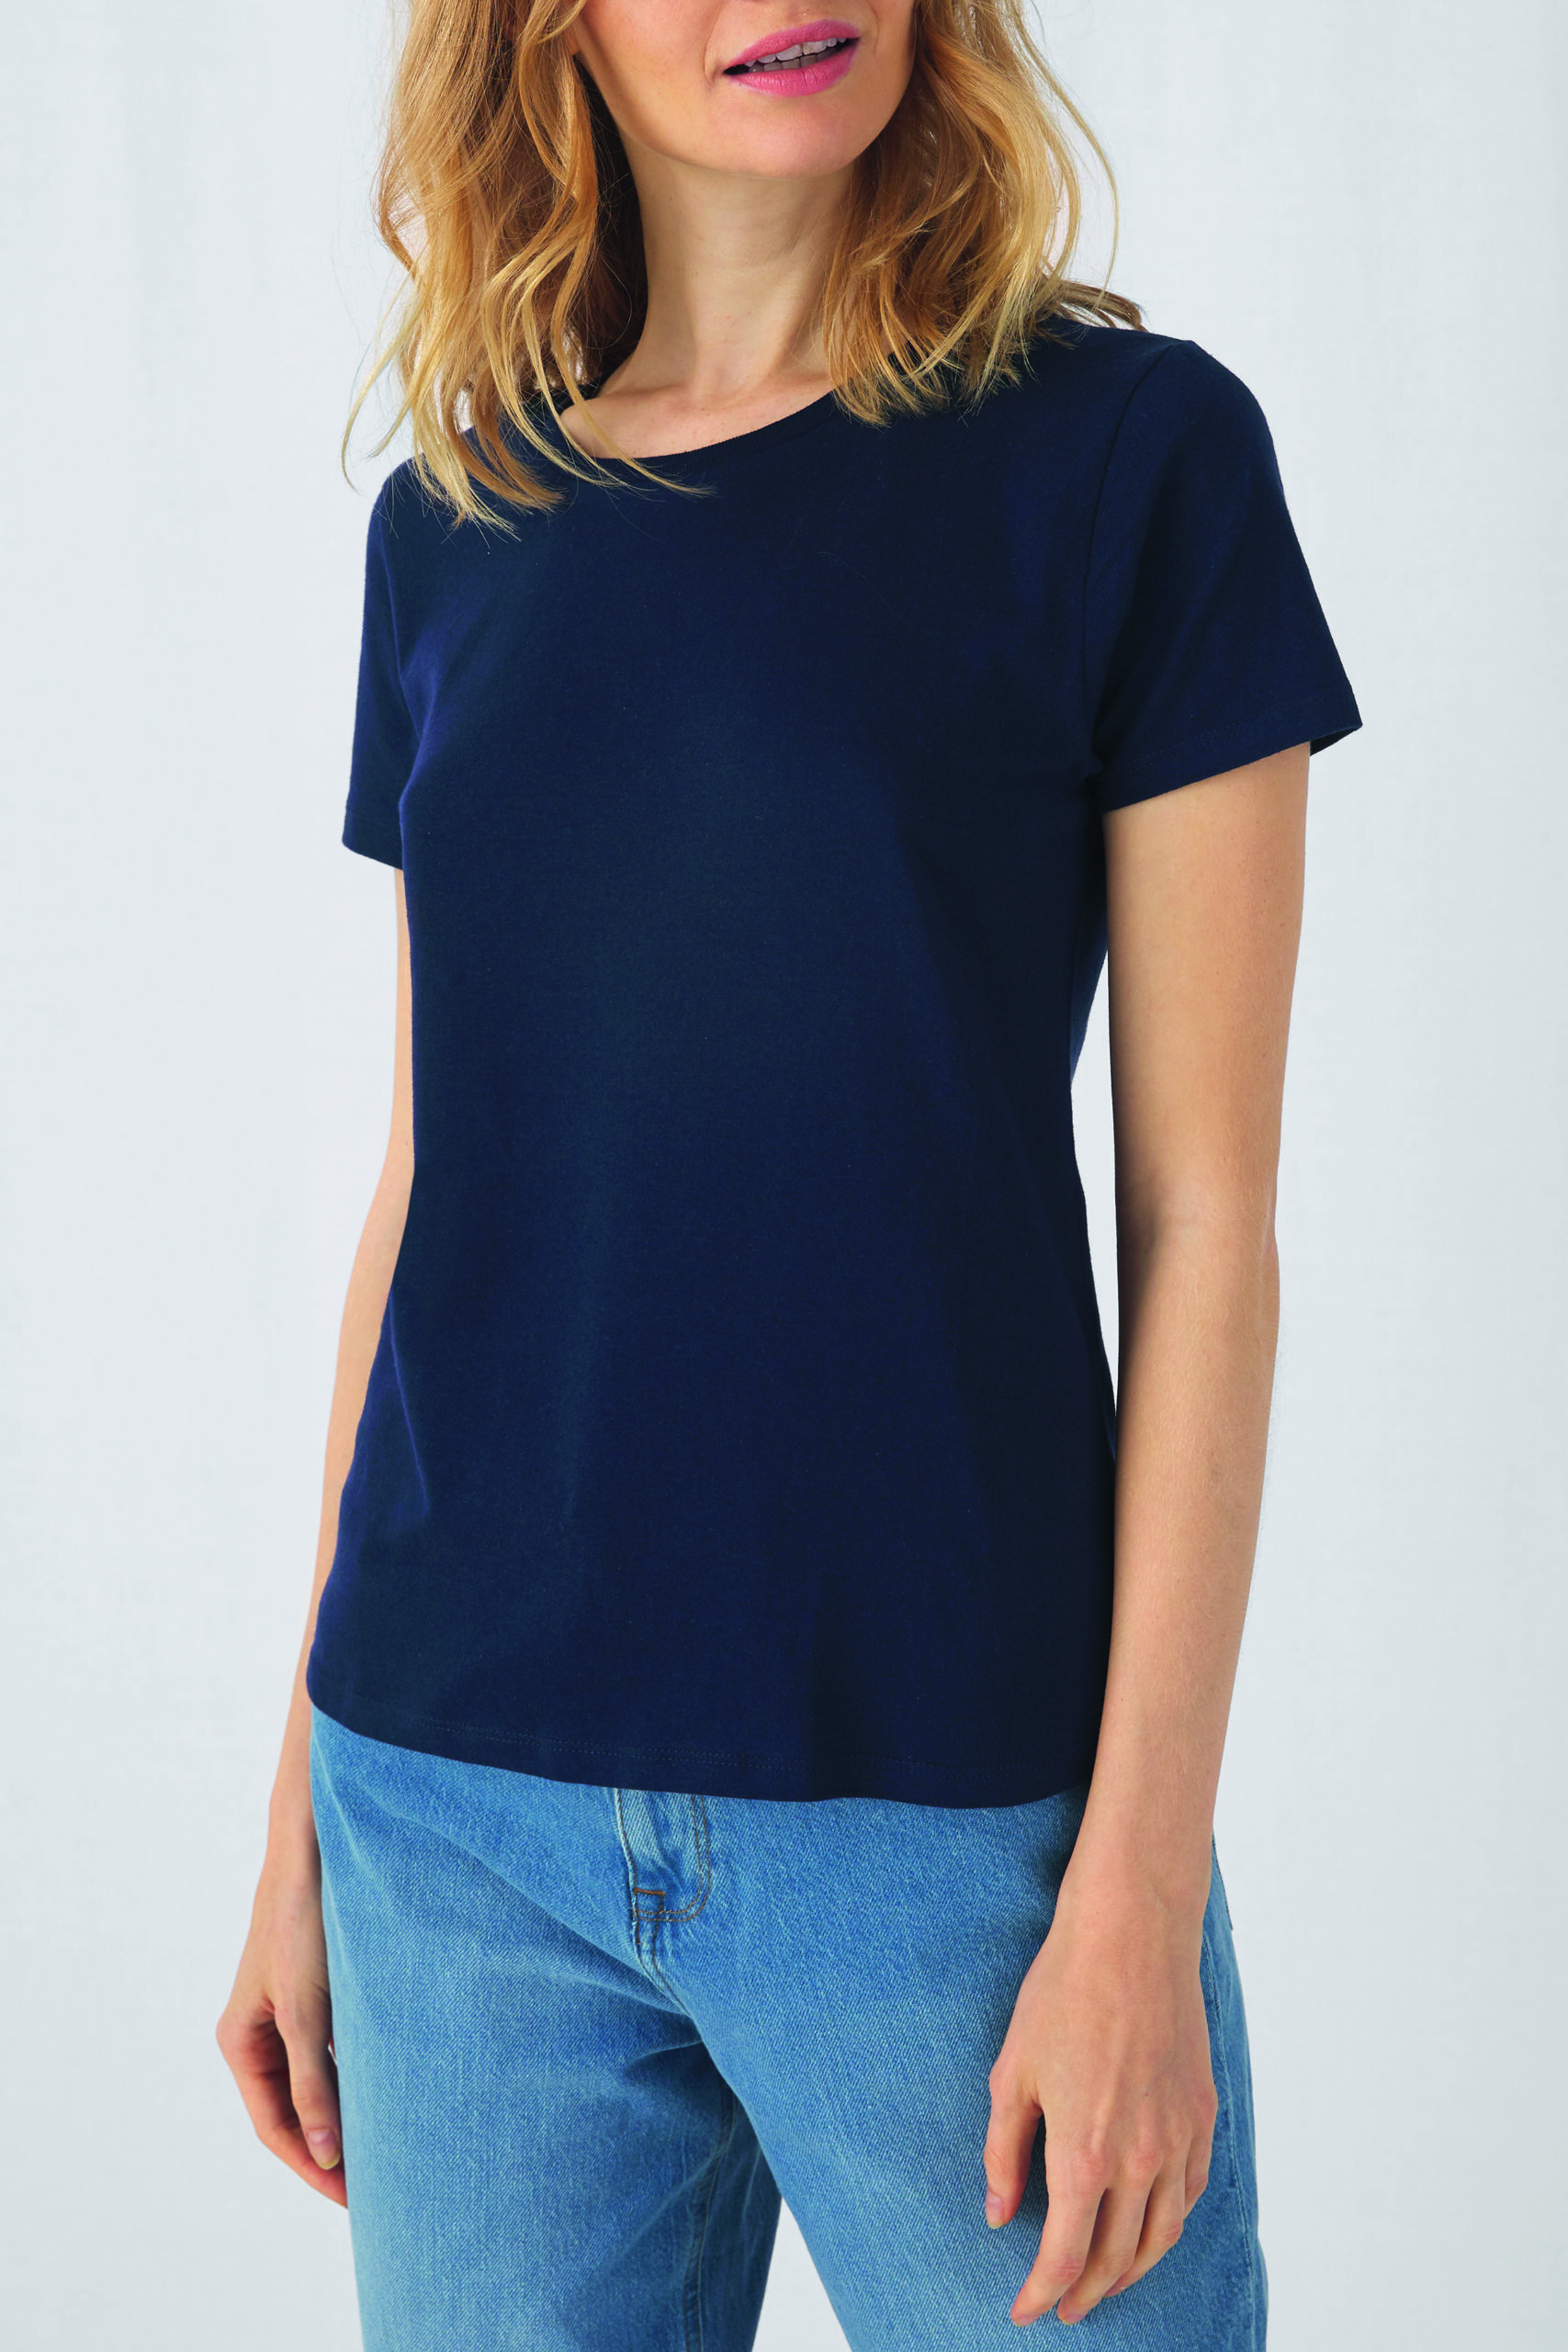 Økologisk, Fair Wear Og Oekotex T-shirt Til Kvinder I En 145g Kvalitet [ BCTW02T]